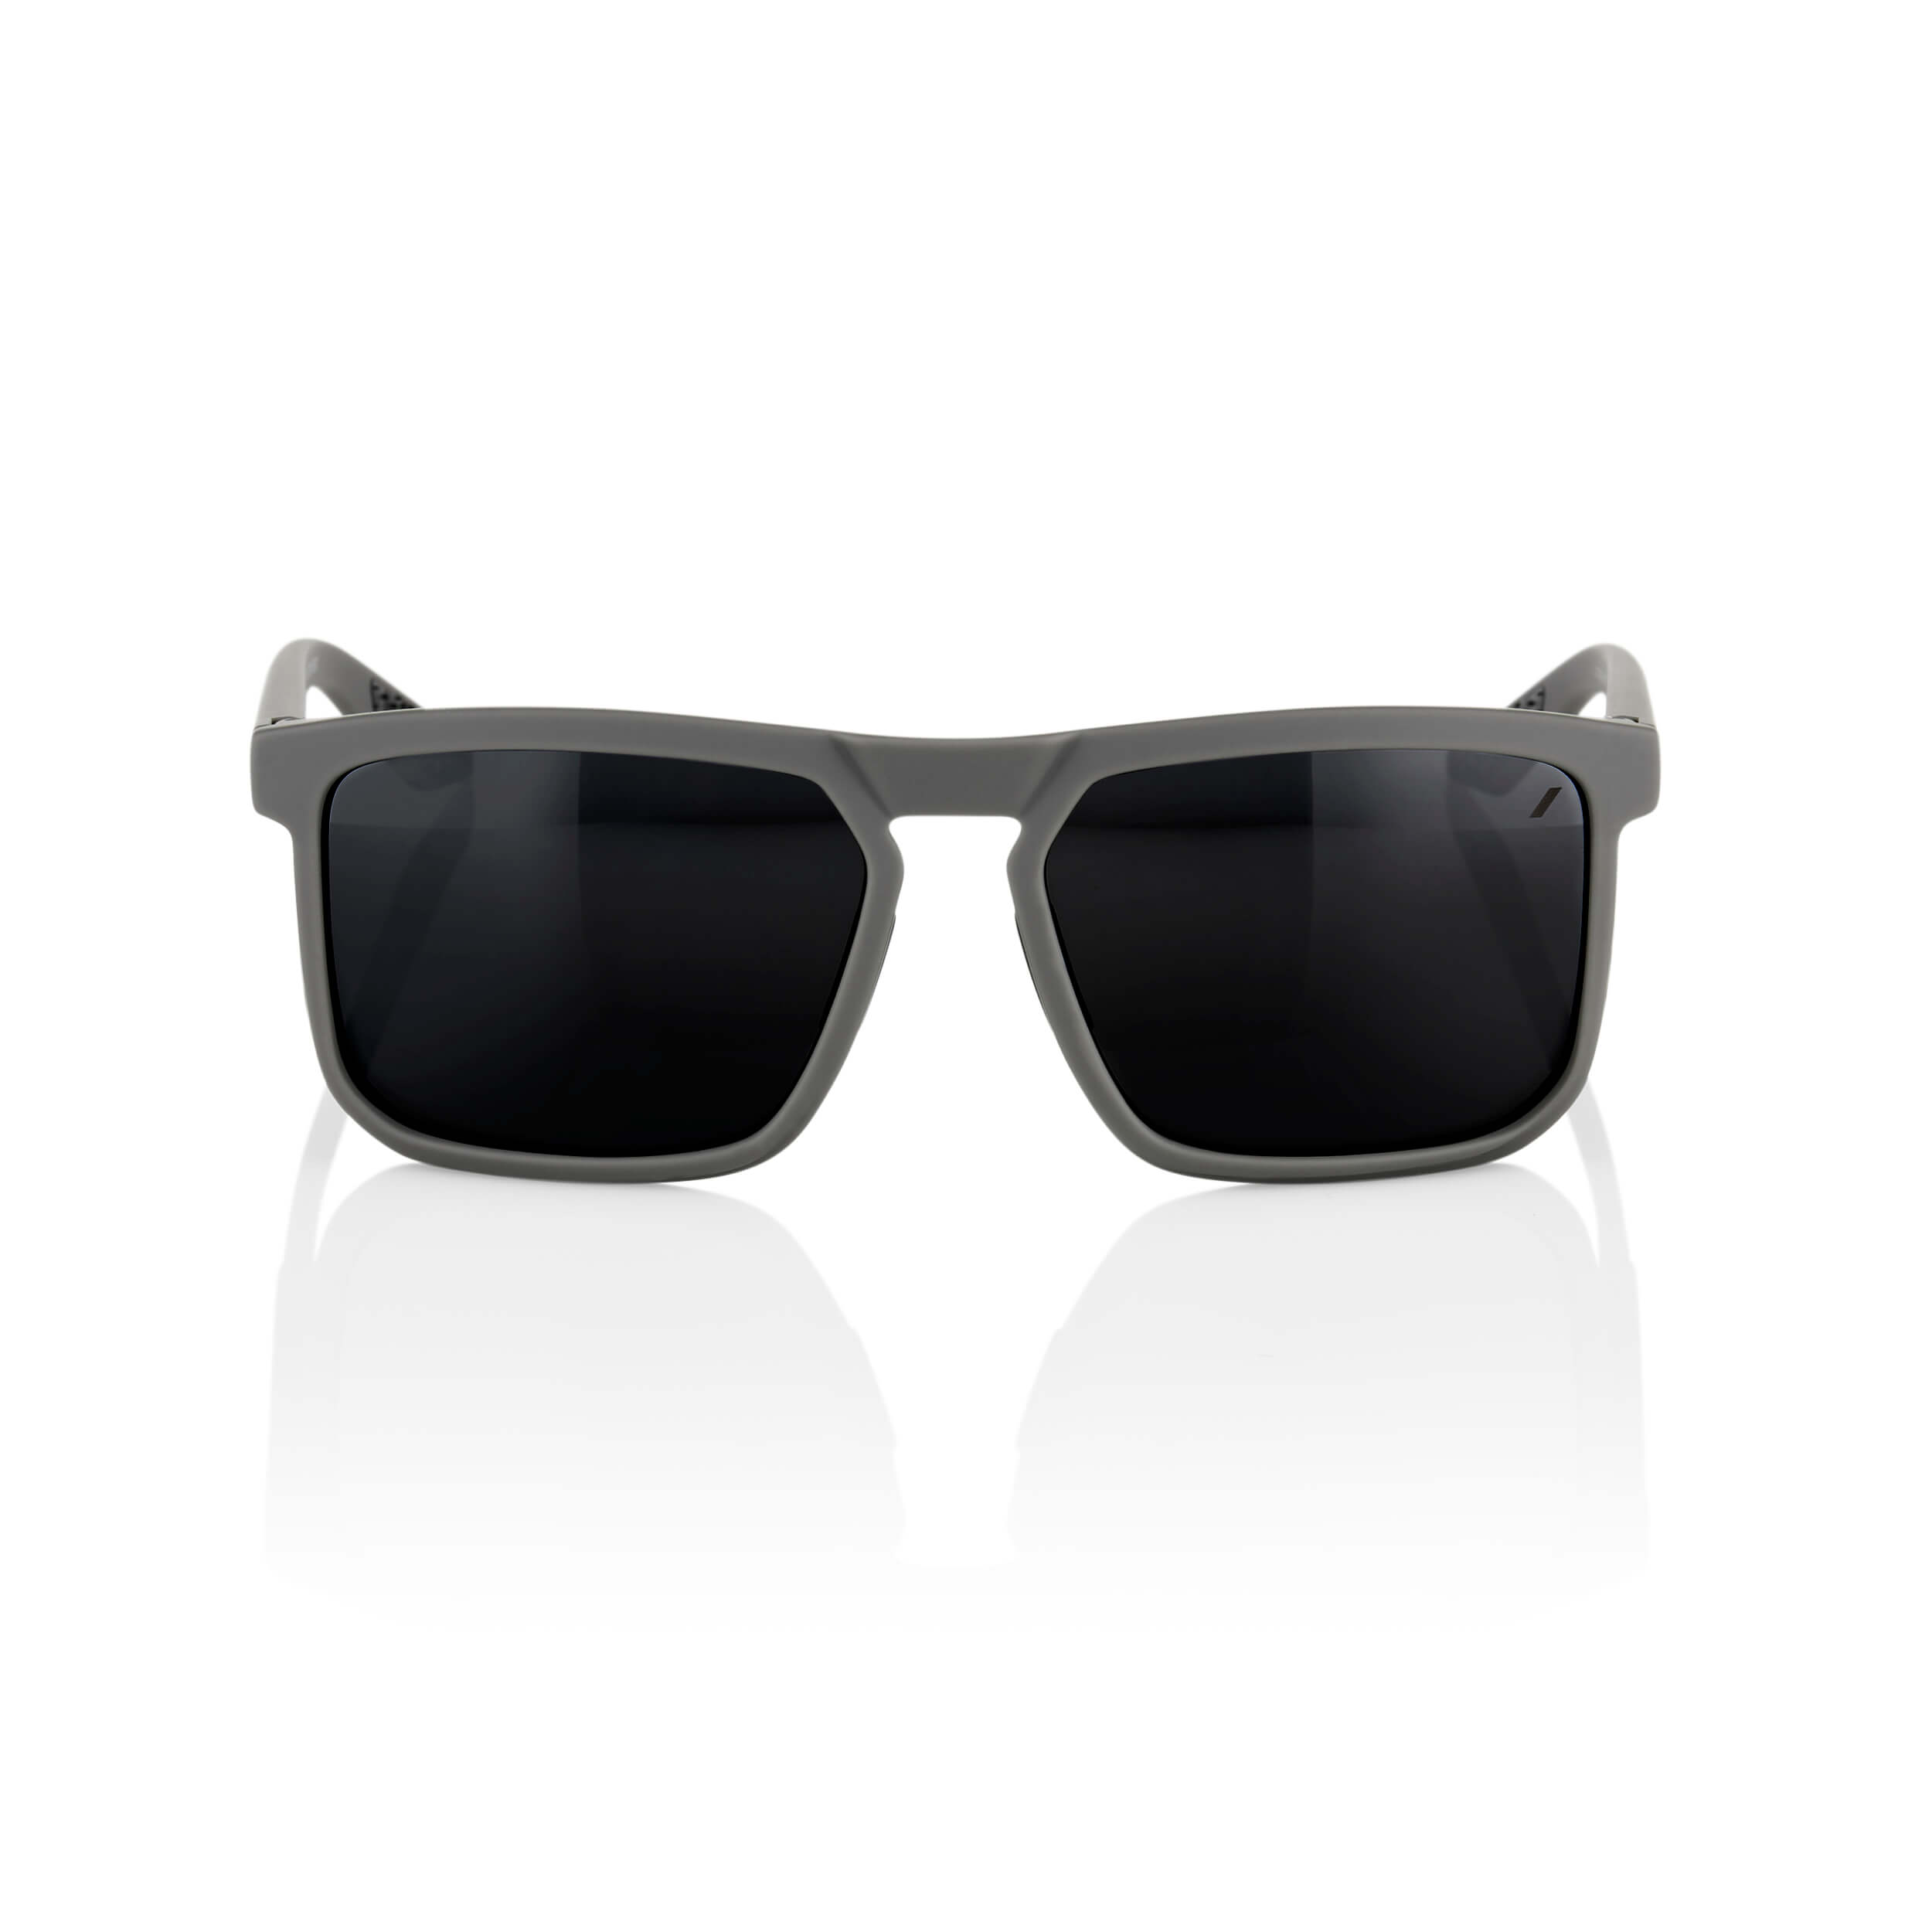 RENSHAW – Soft Tact Cool Grey – Black Mirror Lens